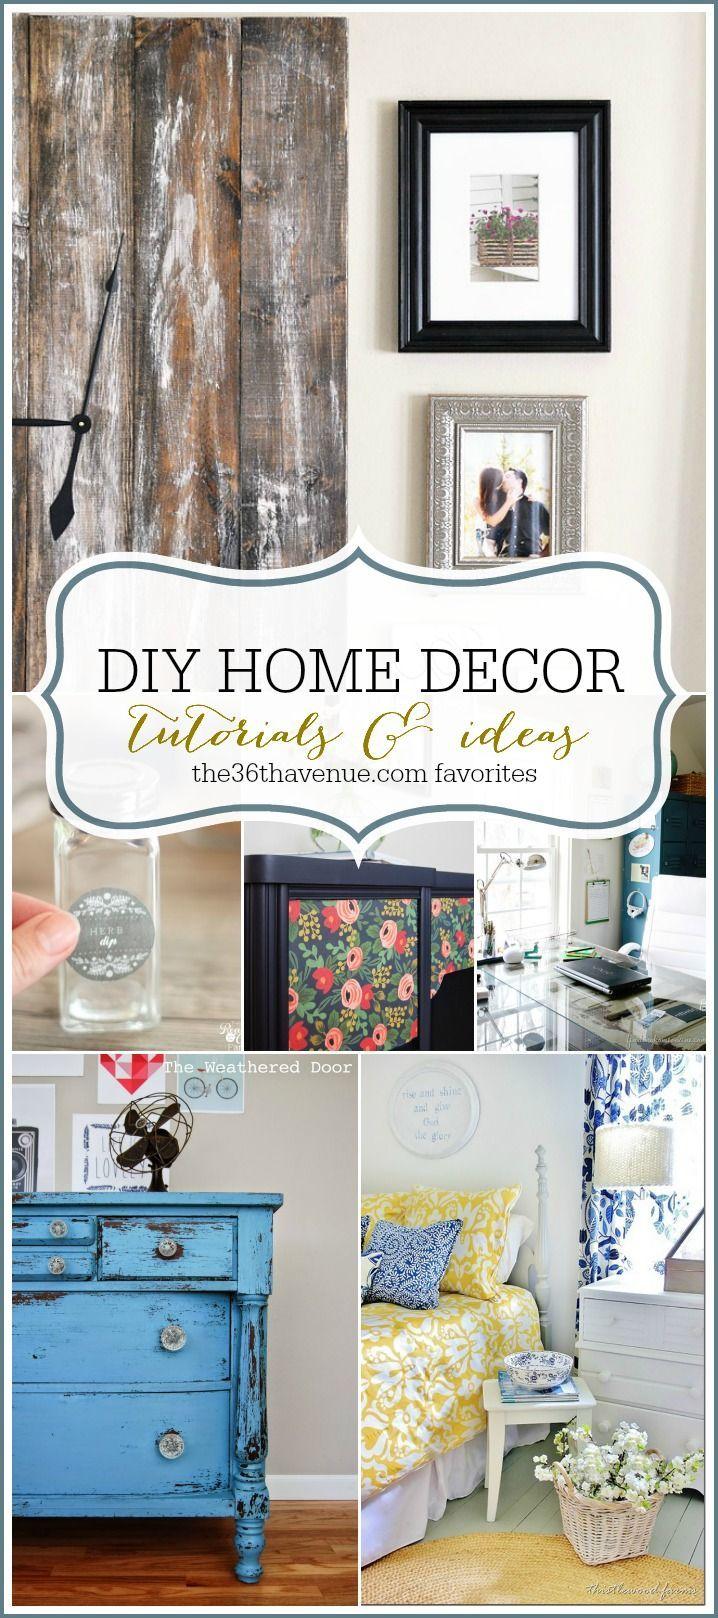 DIY Home Decor Ideas | Pinterest | Decorative objects, Bathroom ...